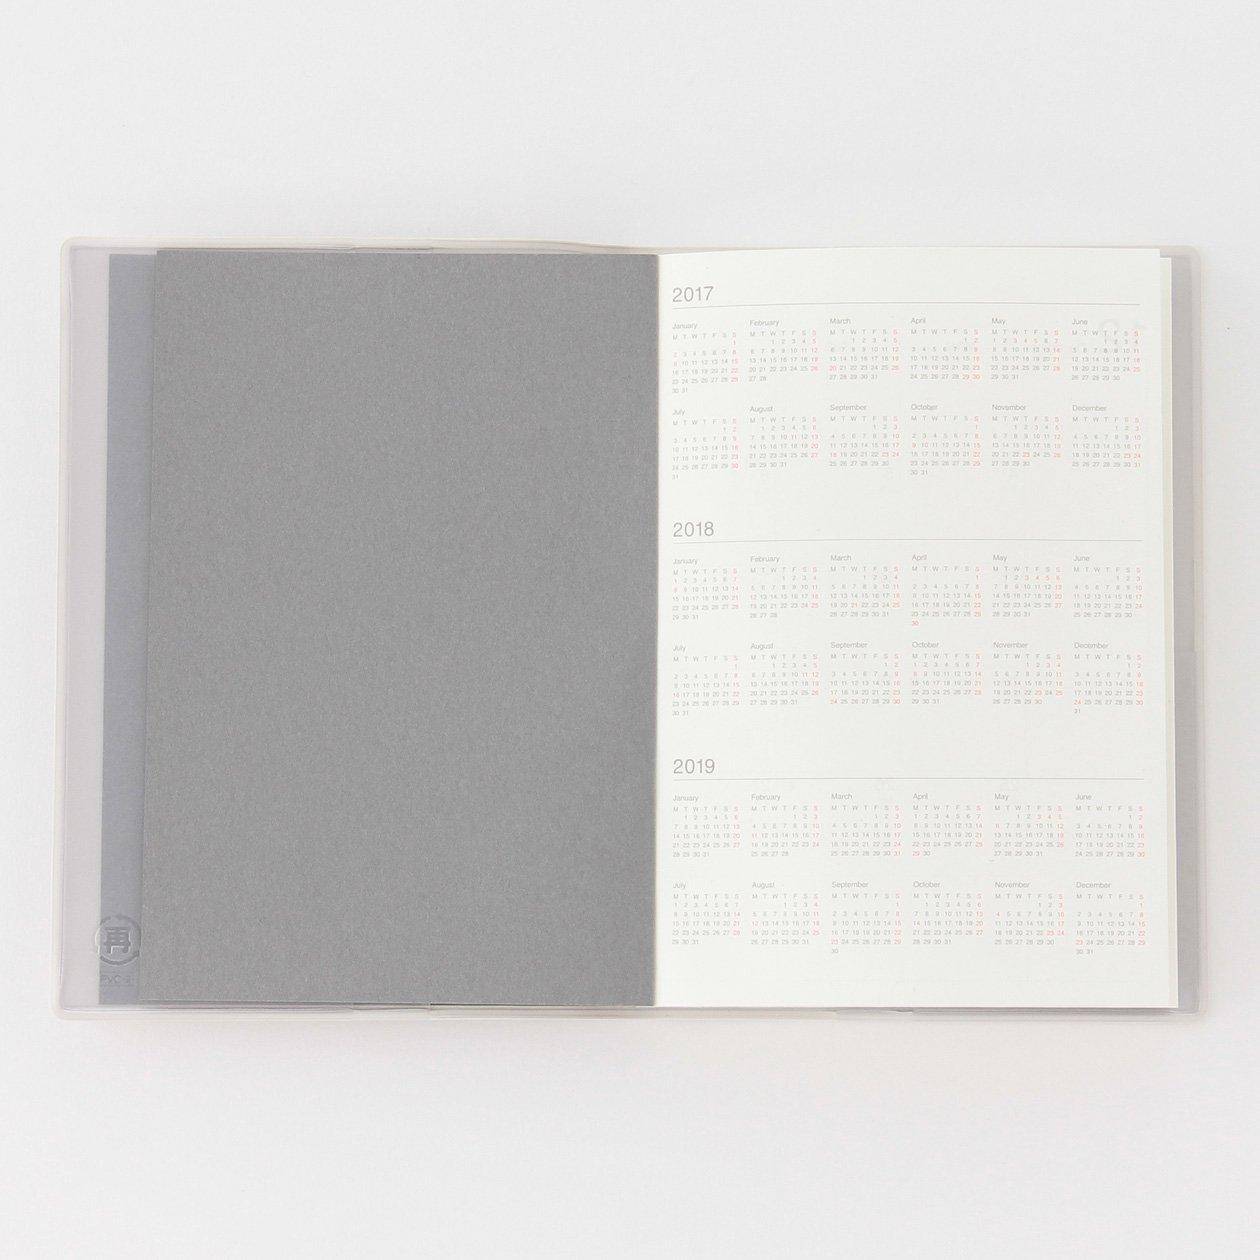 Amazon.com: Muji fino papel reciclado calendario semanal ...